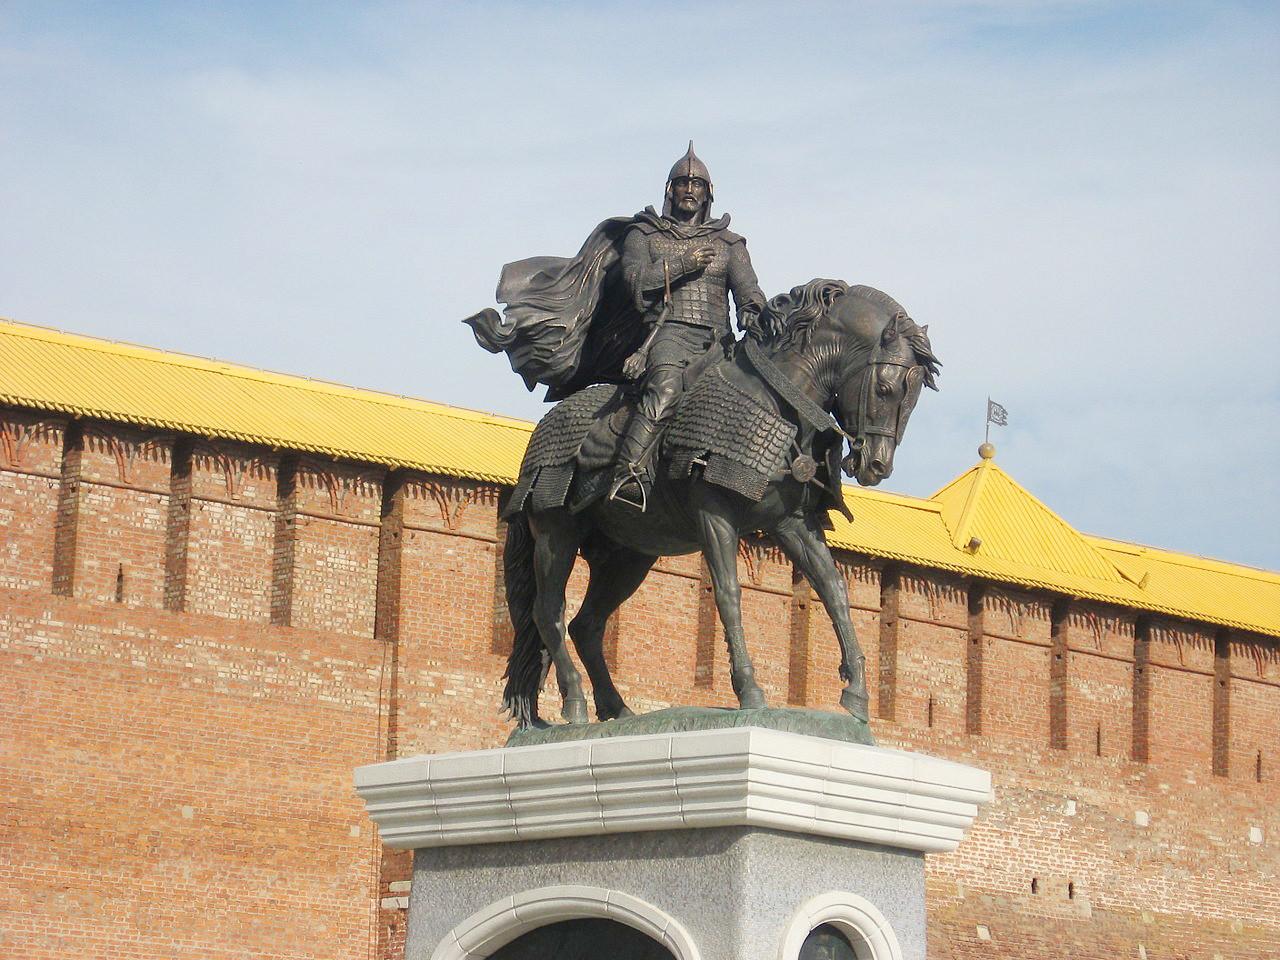 Monument à Dimitri Donskoï près du Kremlin de Kolomna